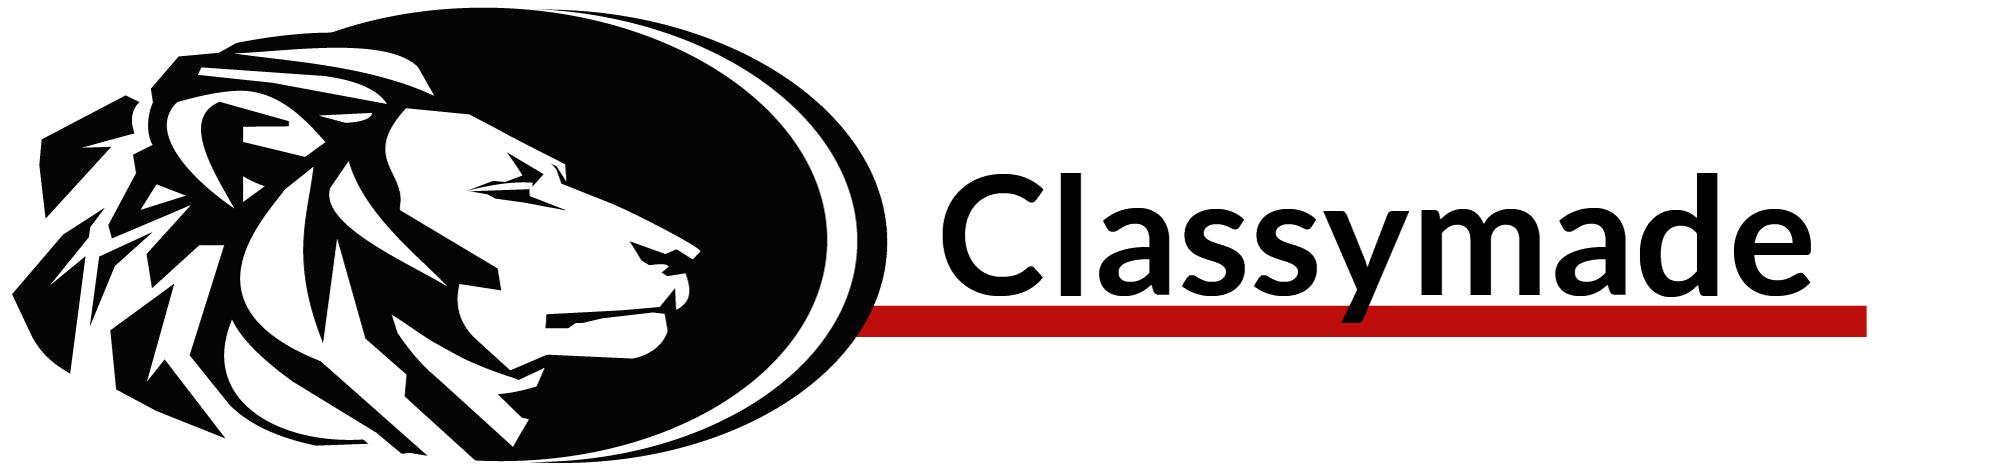 Classymade GmbH